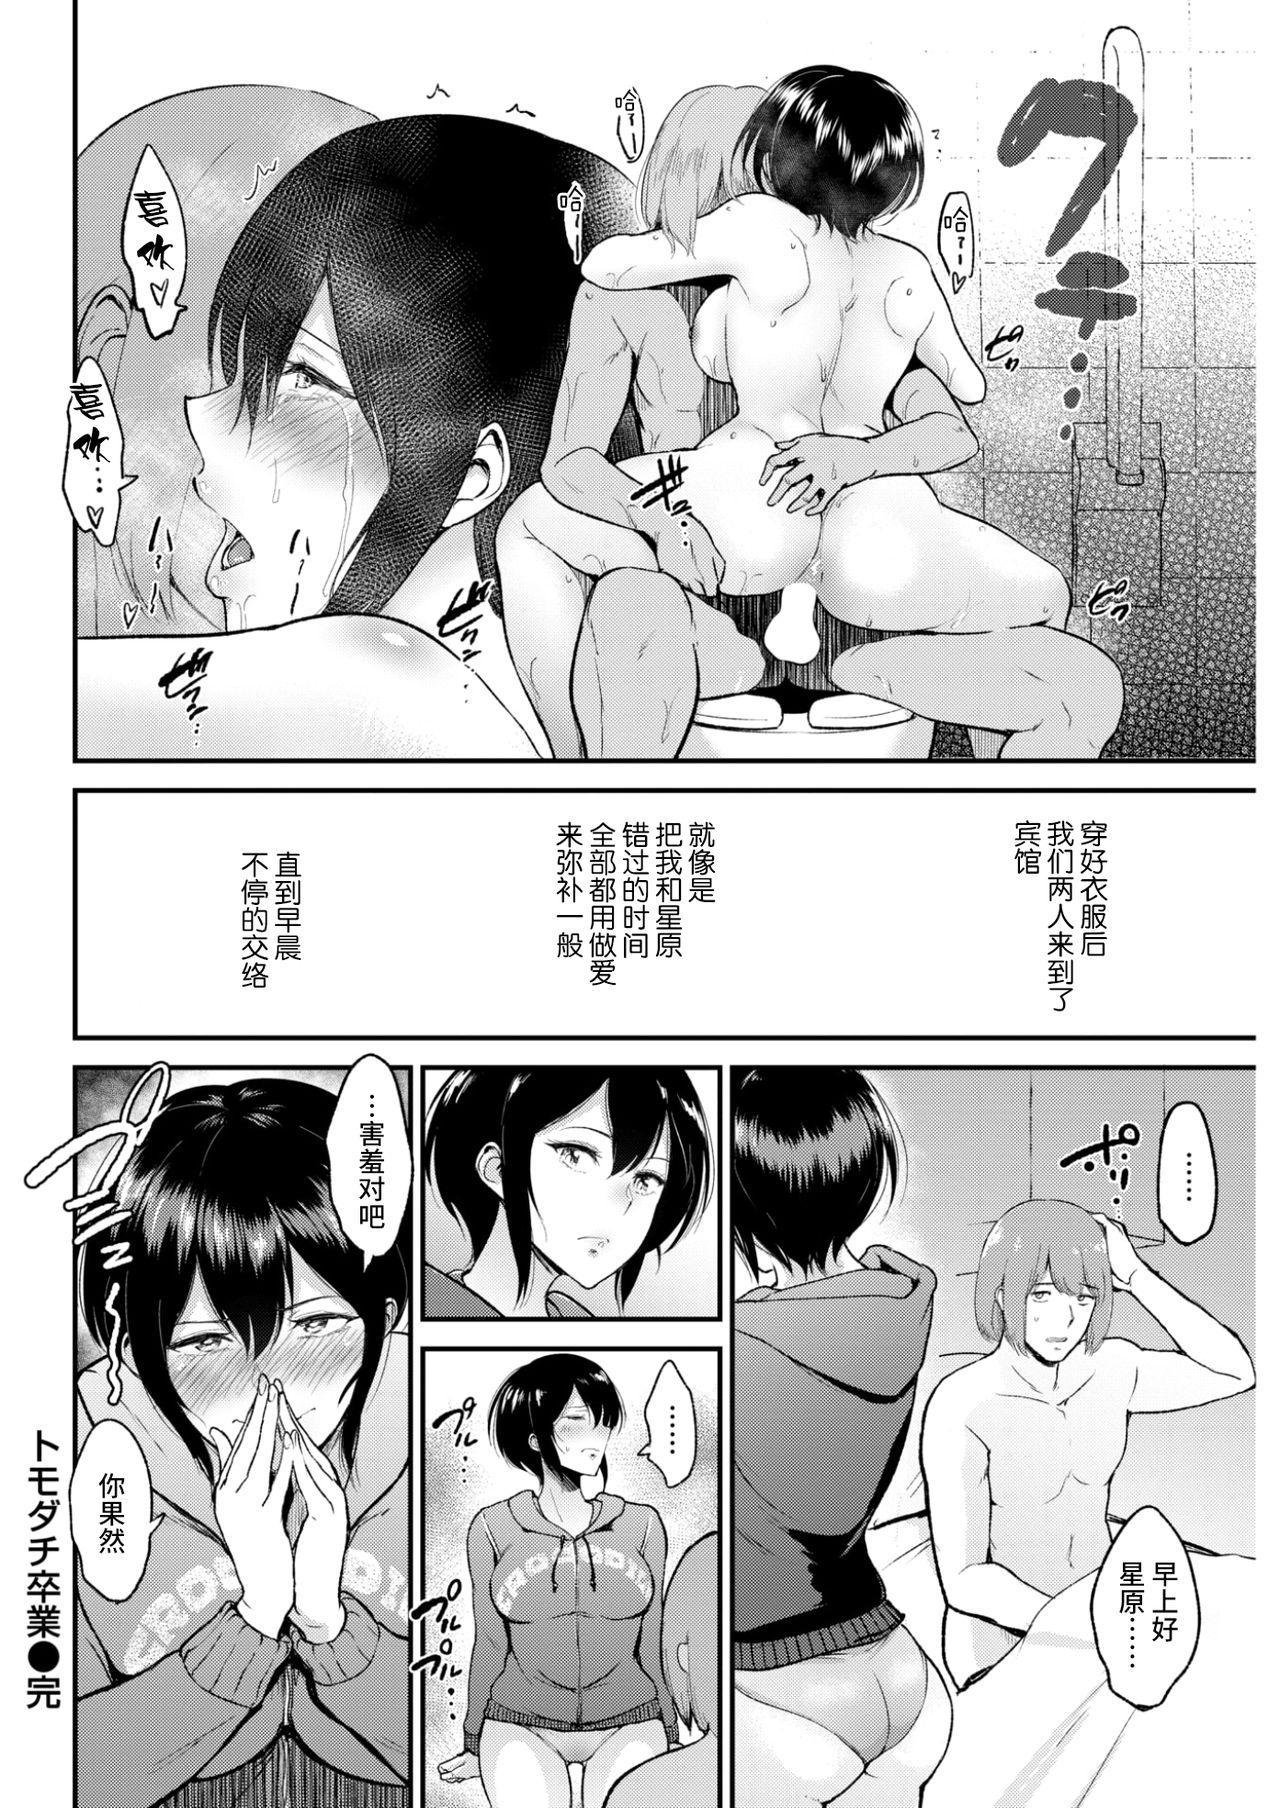 Tomodachi Sotsugyou 16